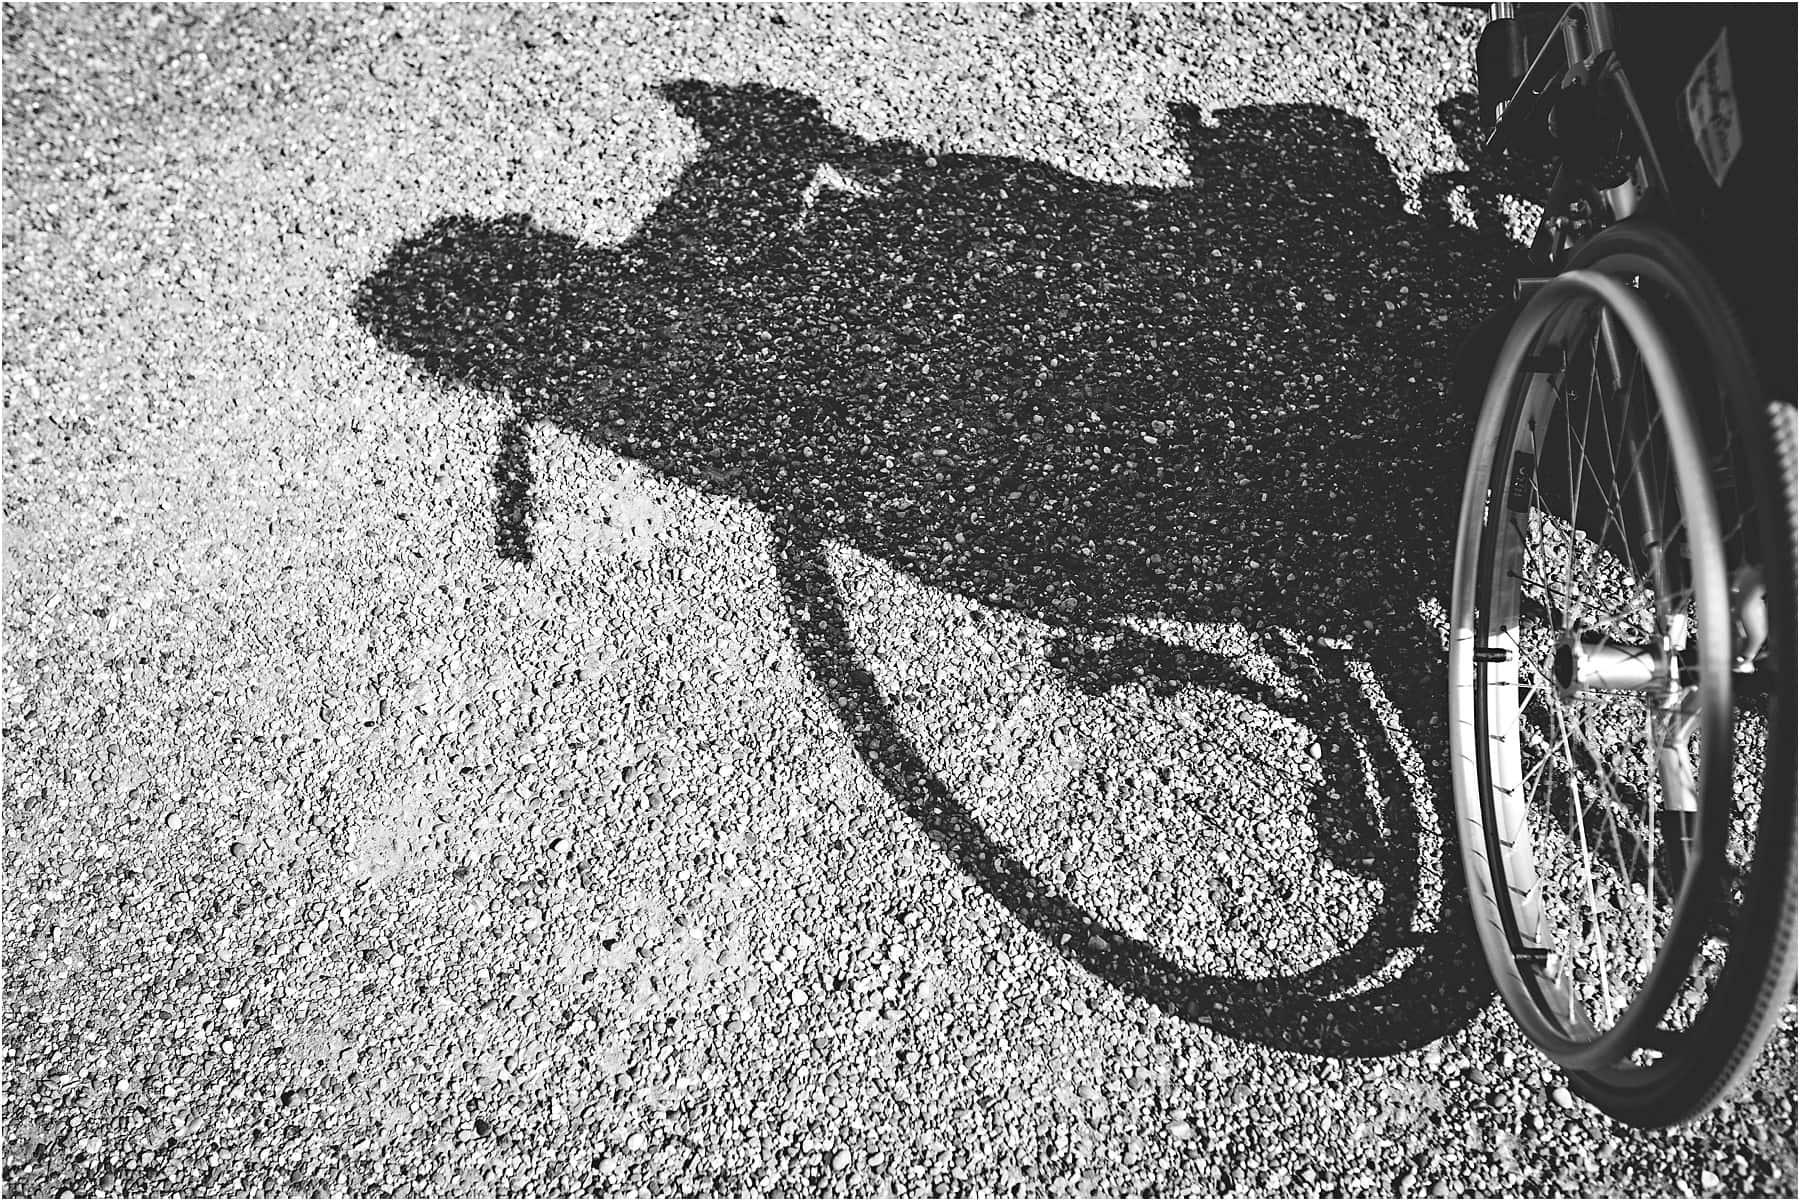 Shadow of a wheelchair